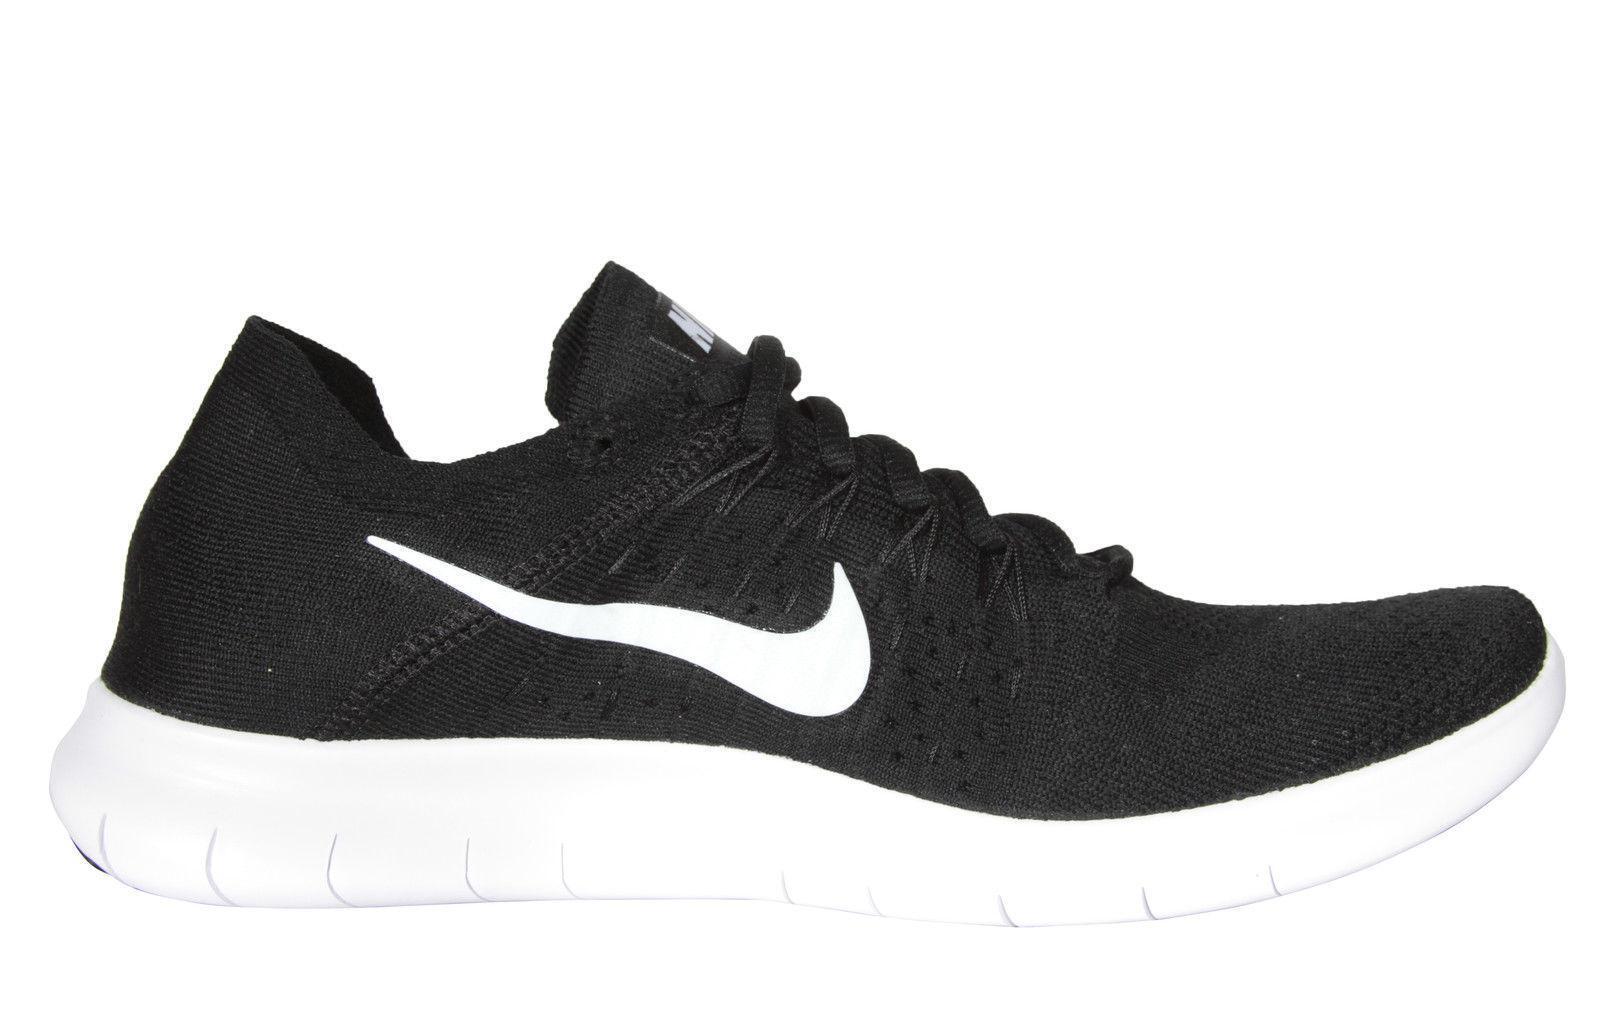 7a2657187816e Nike RN Flyknit 2017 Run Black White Men Running Shoes SNEAKERS ...